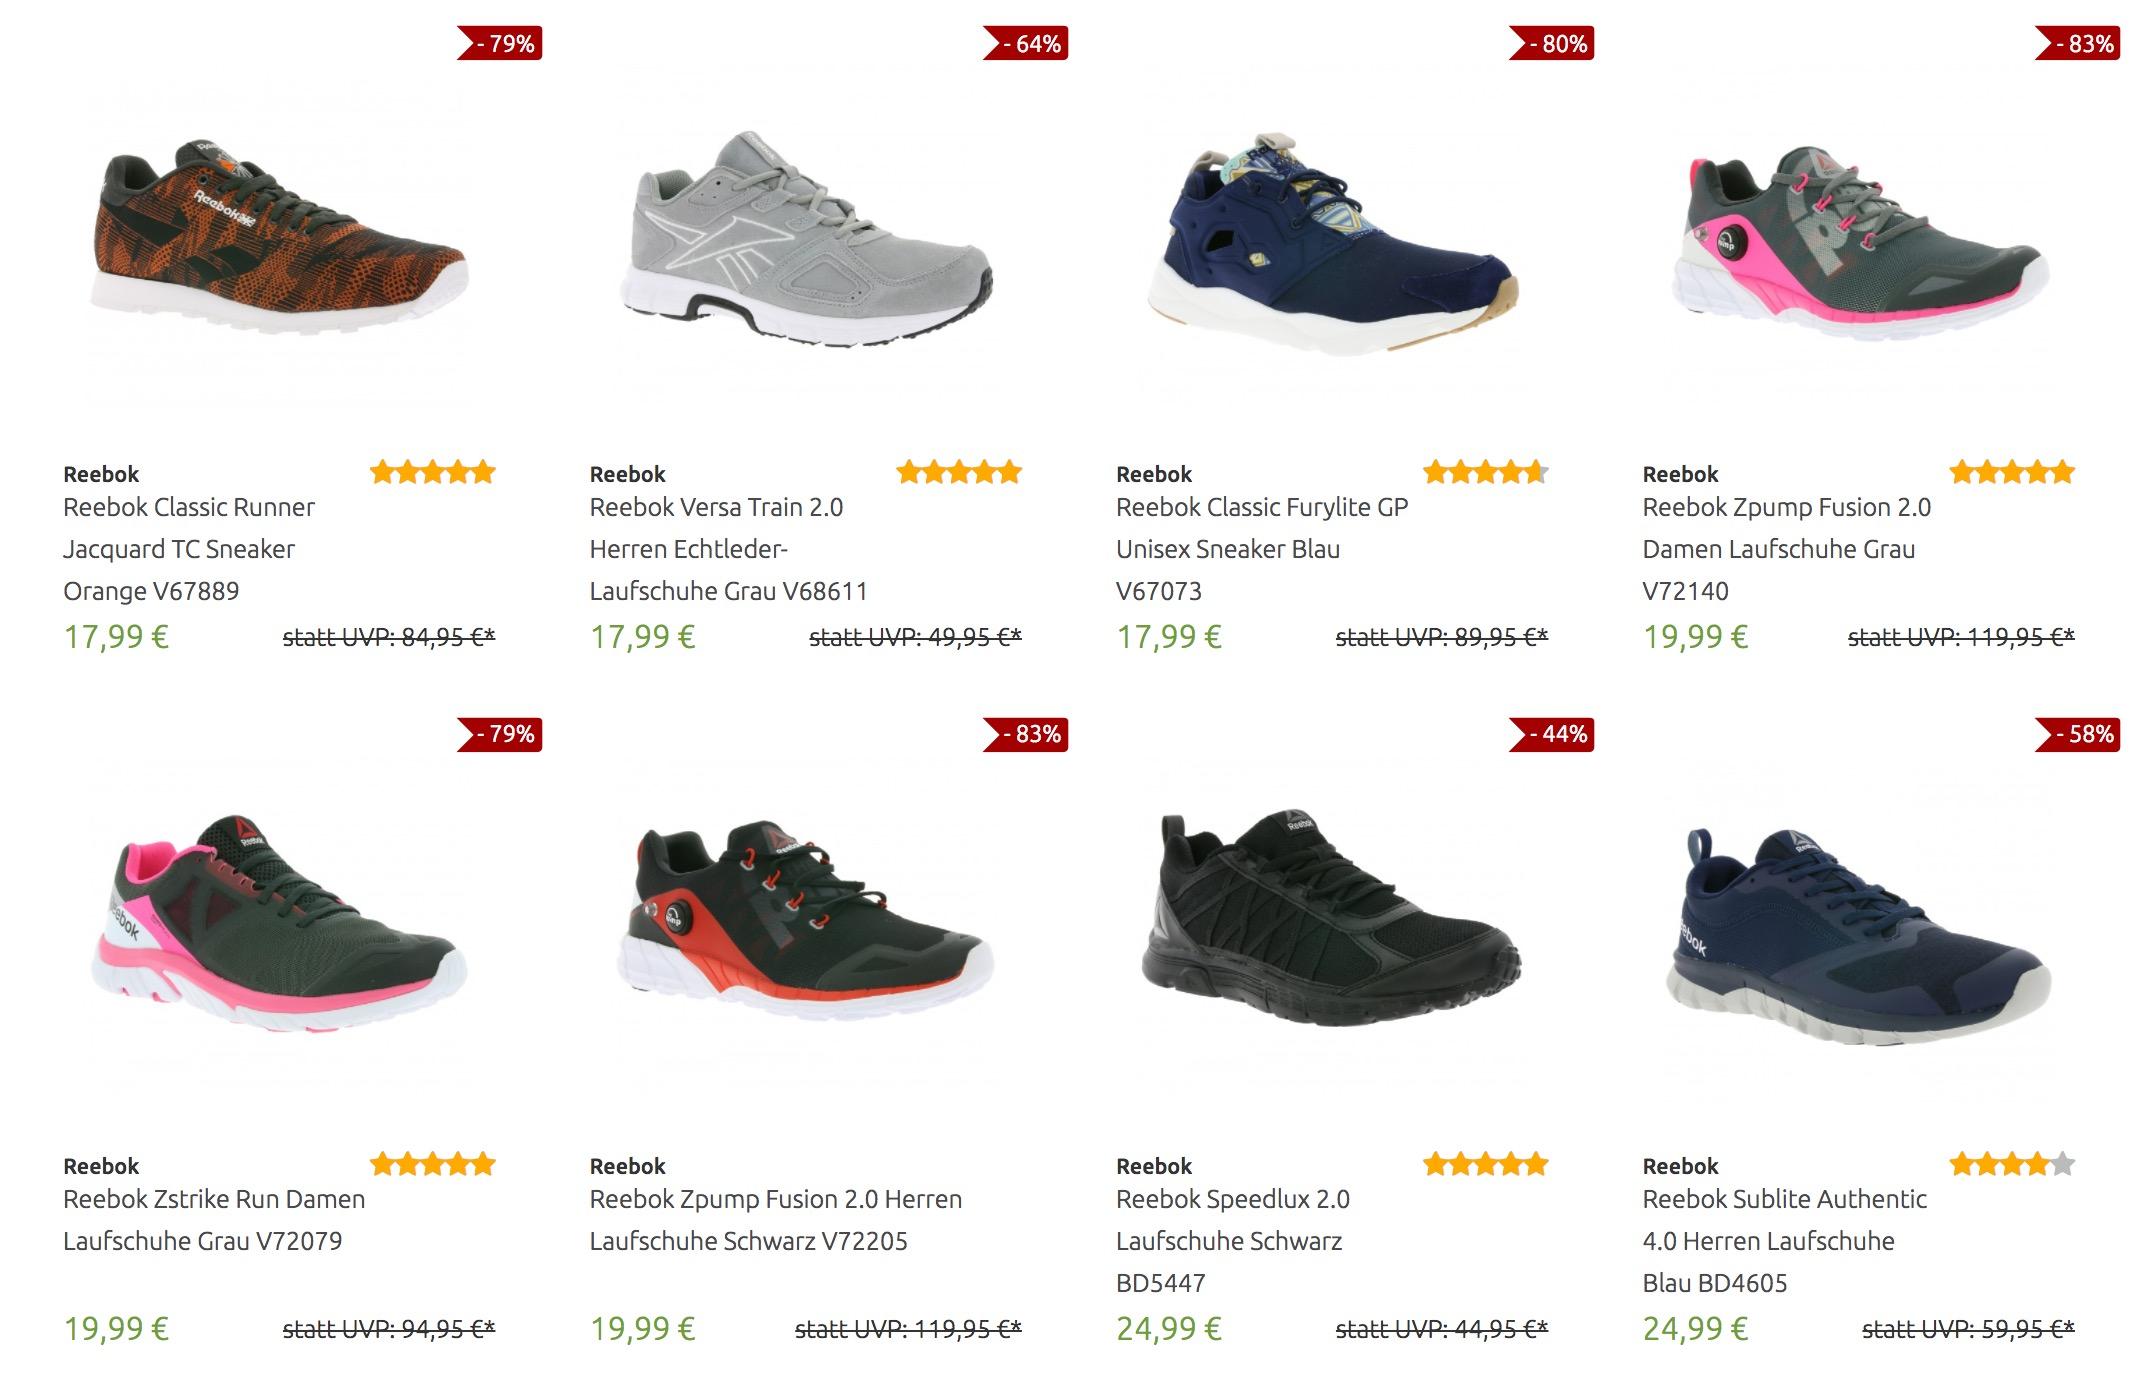 Reebok Classic Runner Jacquard TC Sneaker Orange V67889